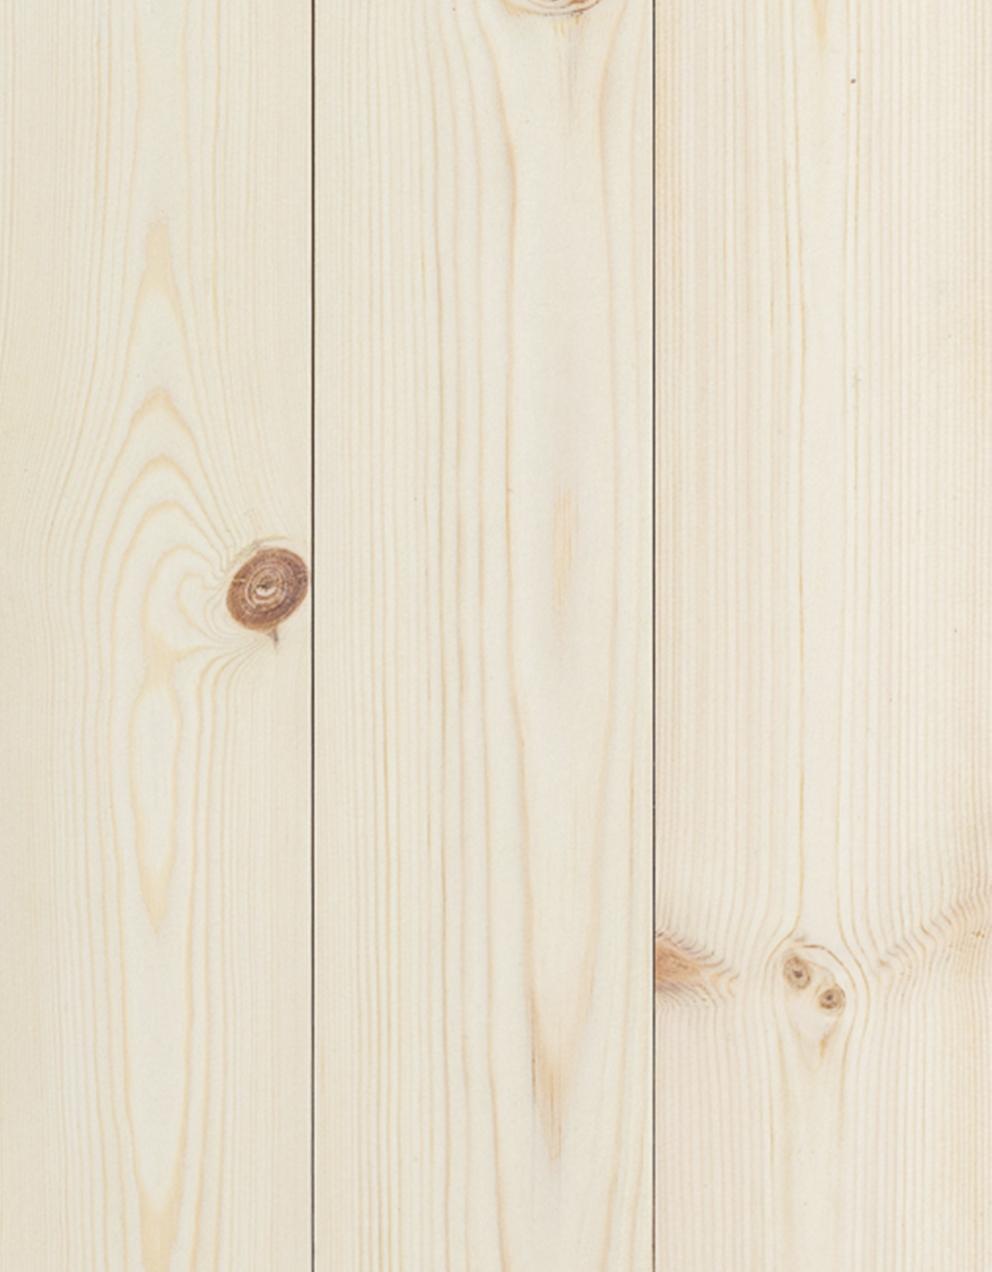 Suelos de madera Pino claro. Detarima